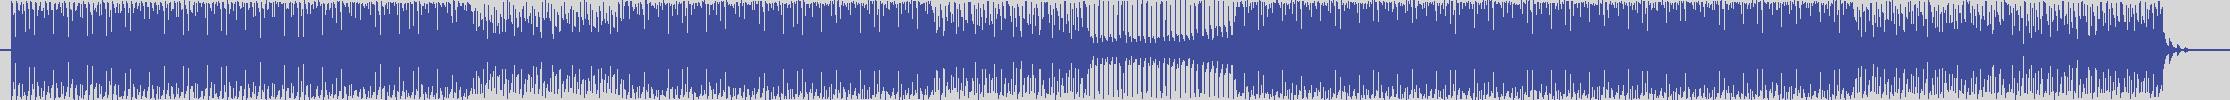 workin [WRK011] Association Pyramid - Refilable [Fashion Corporation's Big Mix] audio wave form